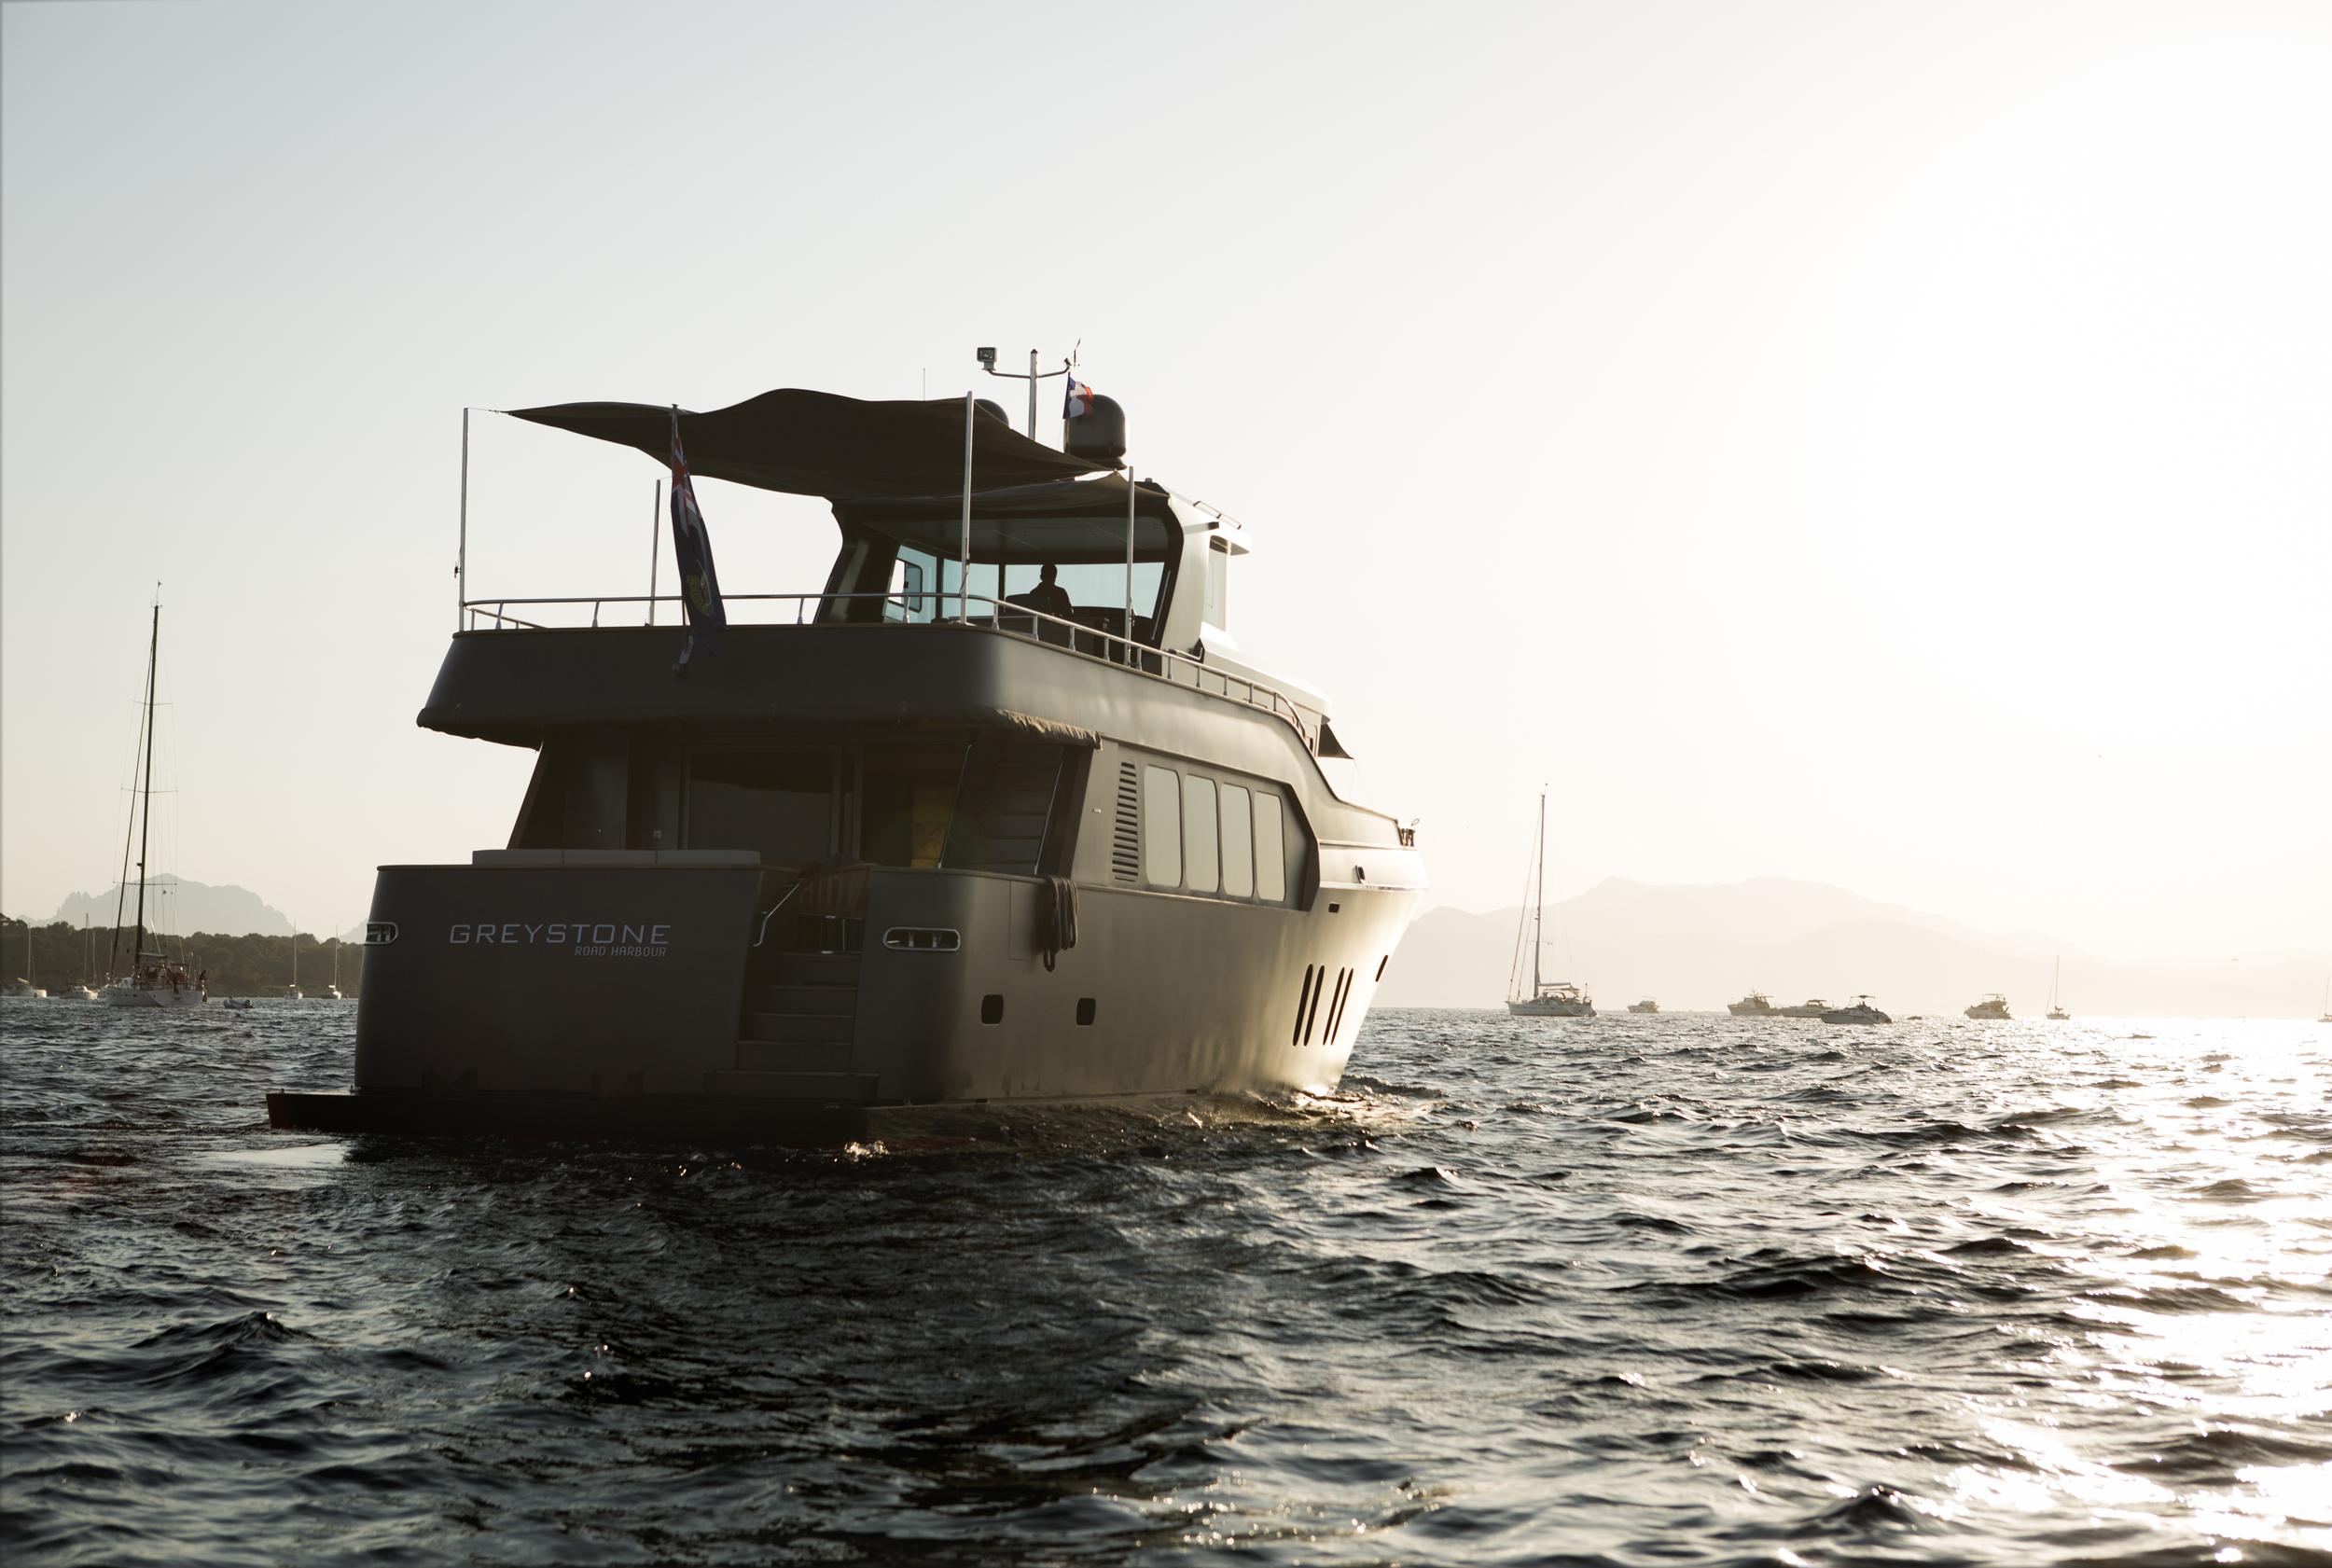 greystone-yacht-hero-shot-2.jpg